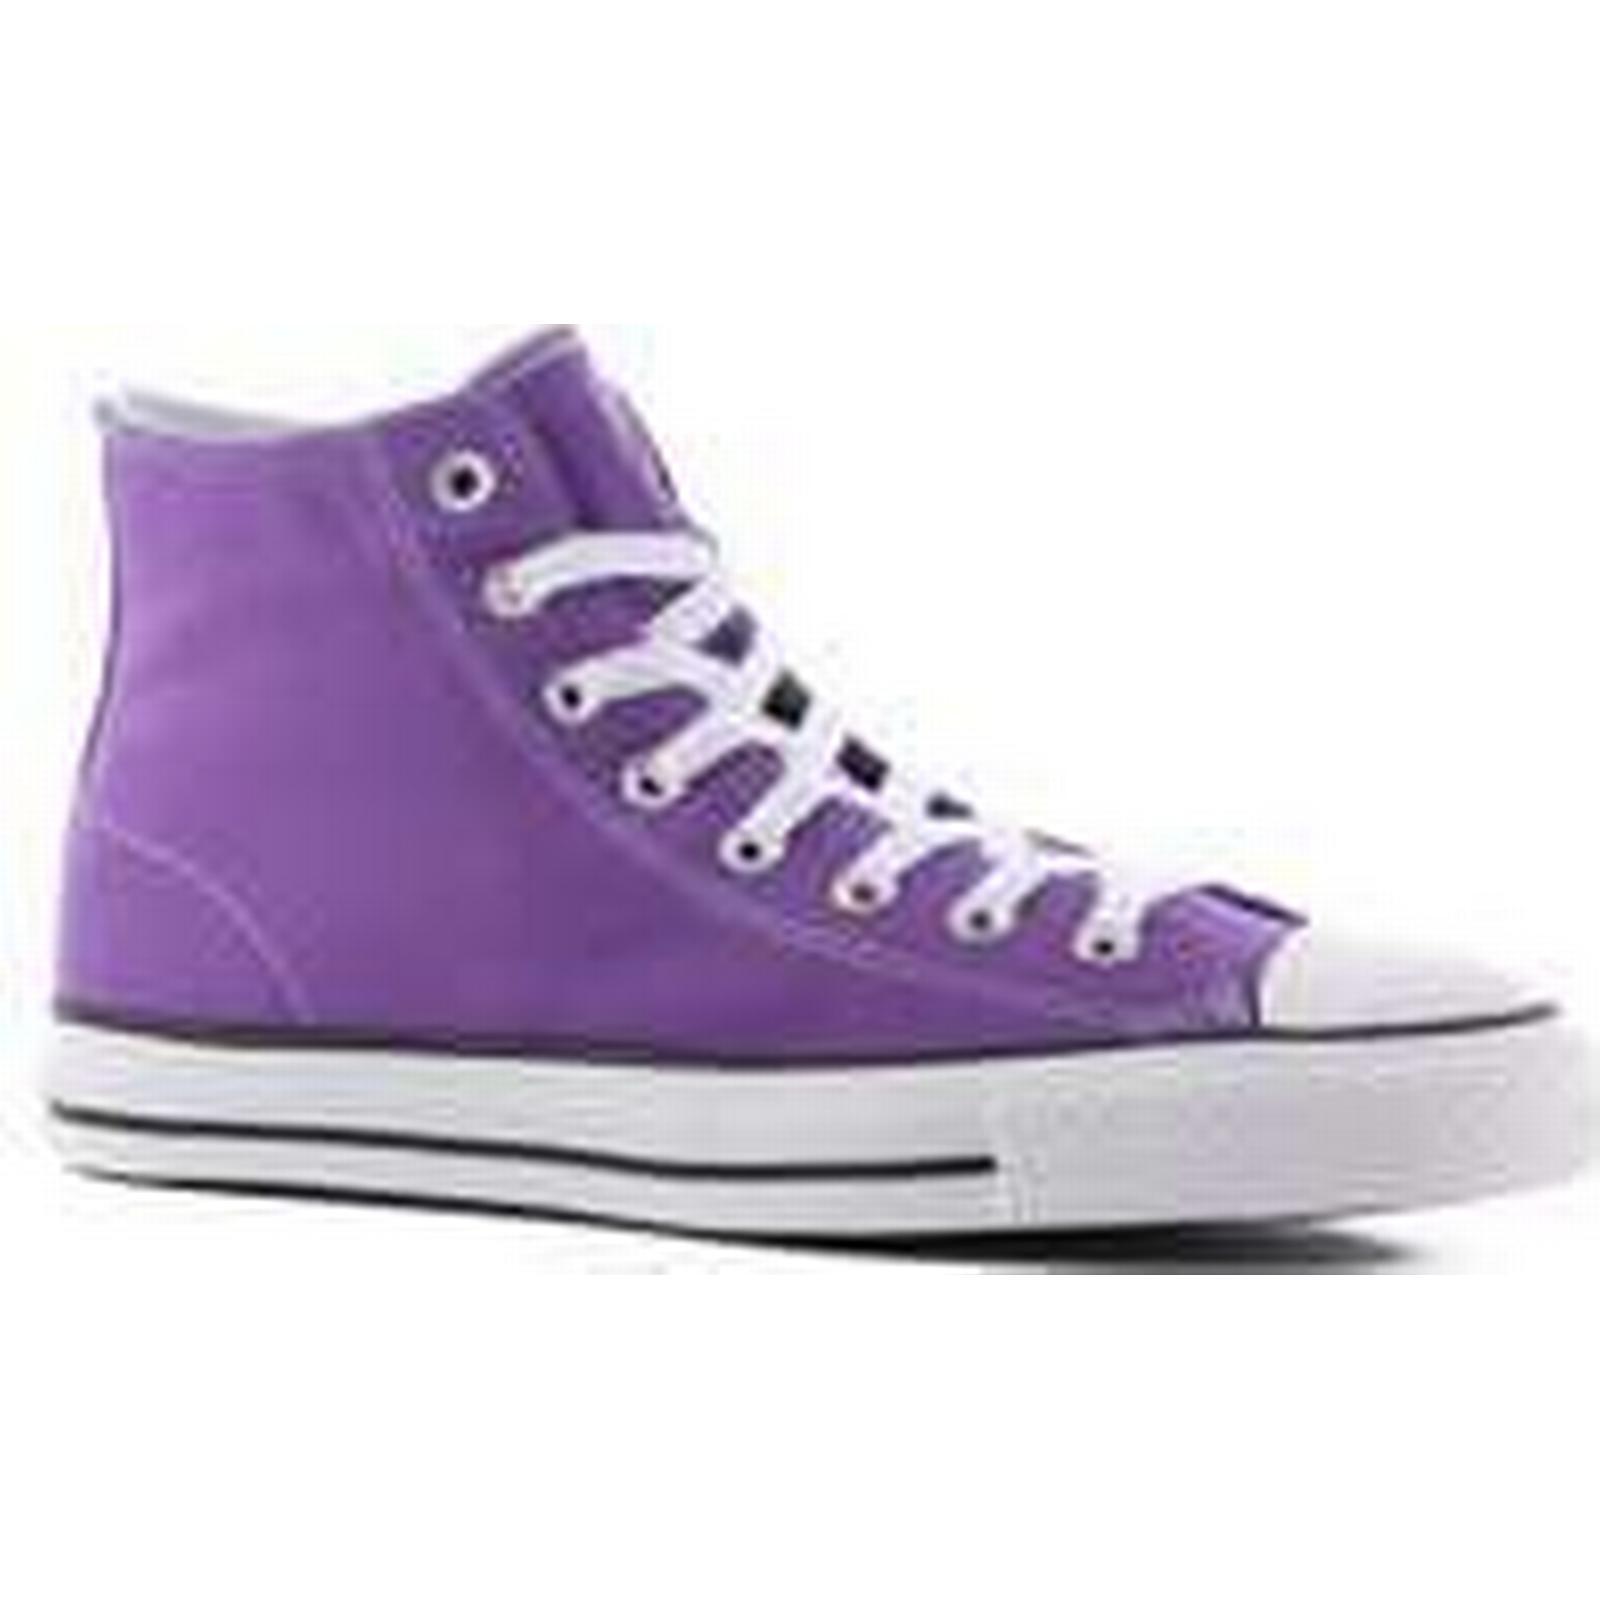 Converse Chuck High Taylor All Star Pro High Chuck Purple Skate Shoes electric purple 3dd222